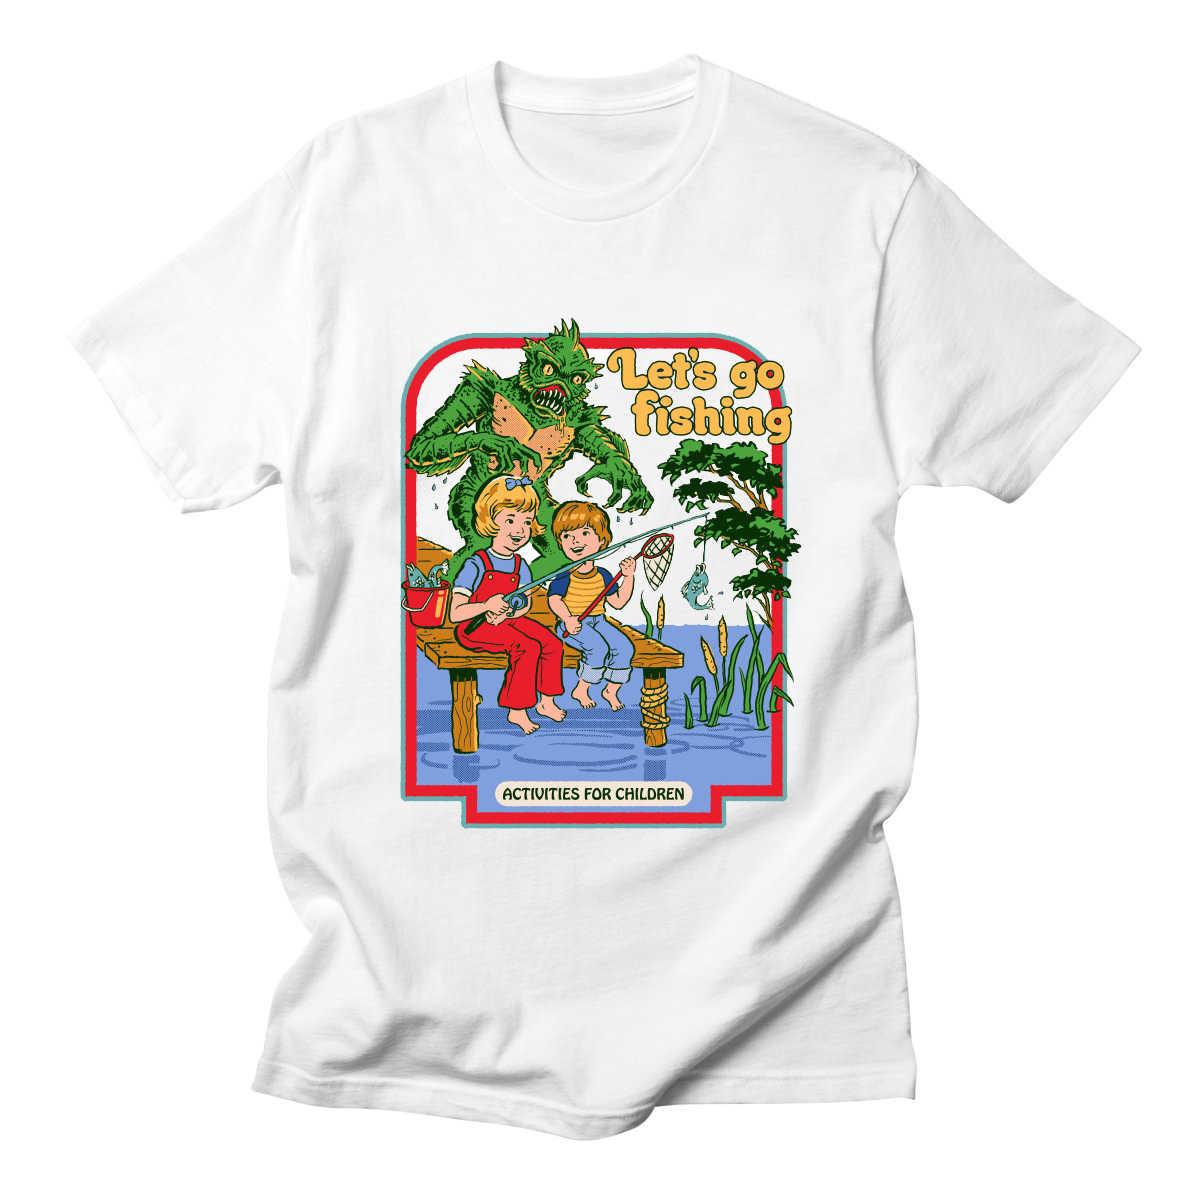 02187cd2b Men Cotton Short Sleeve Let's Summon Demons Graphic Tops Harajuku Summer  Let's Make Brownies T Shirt